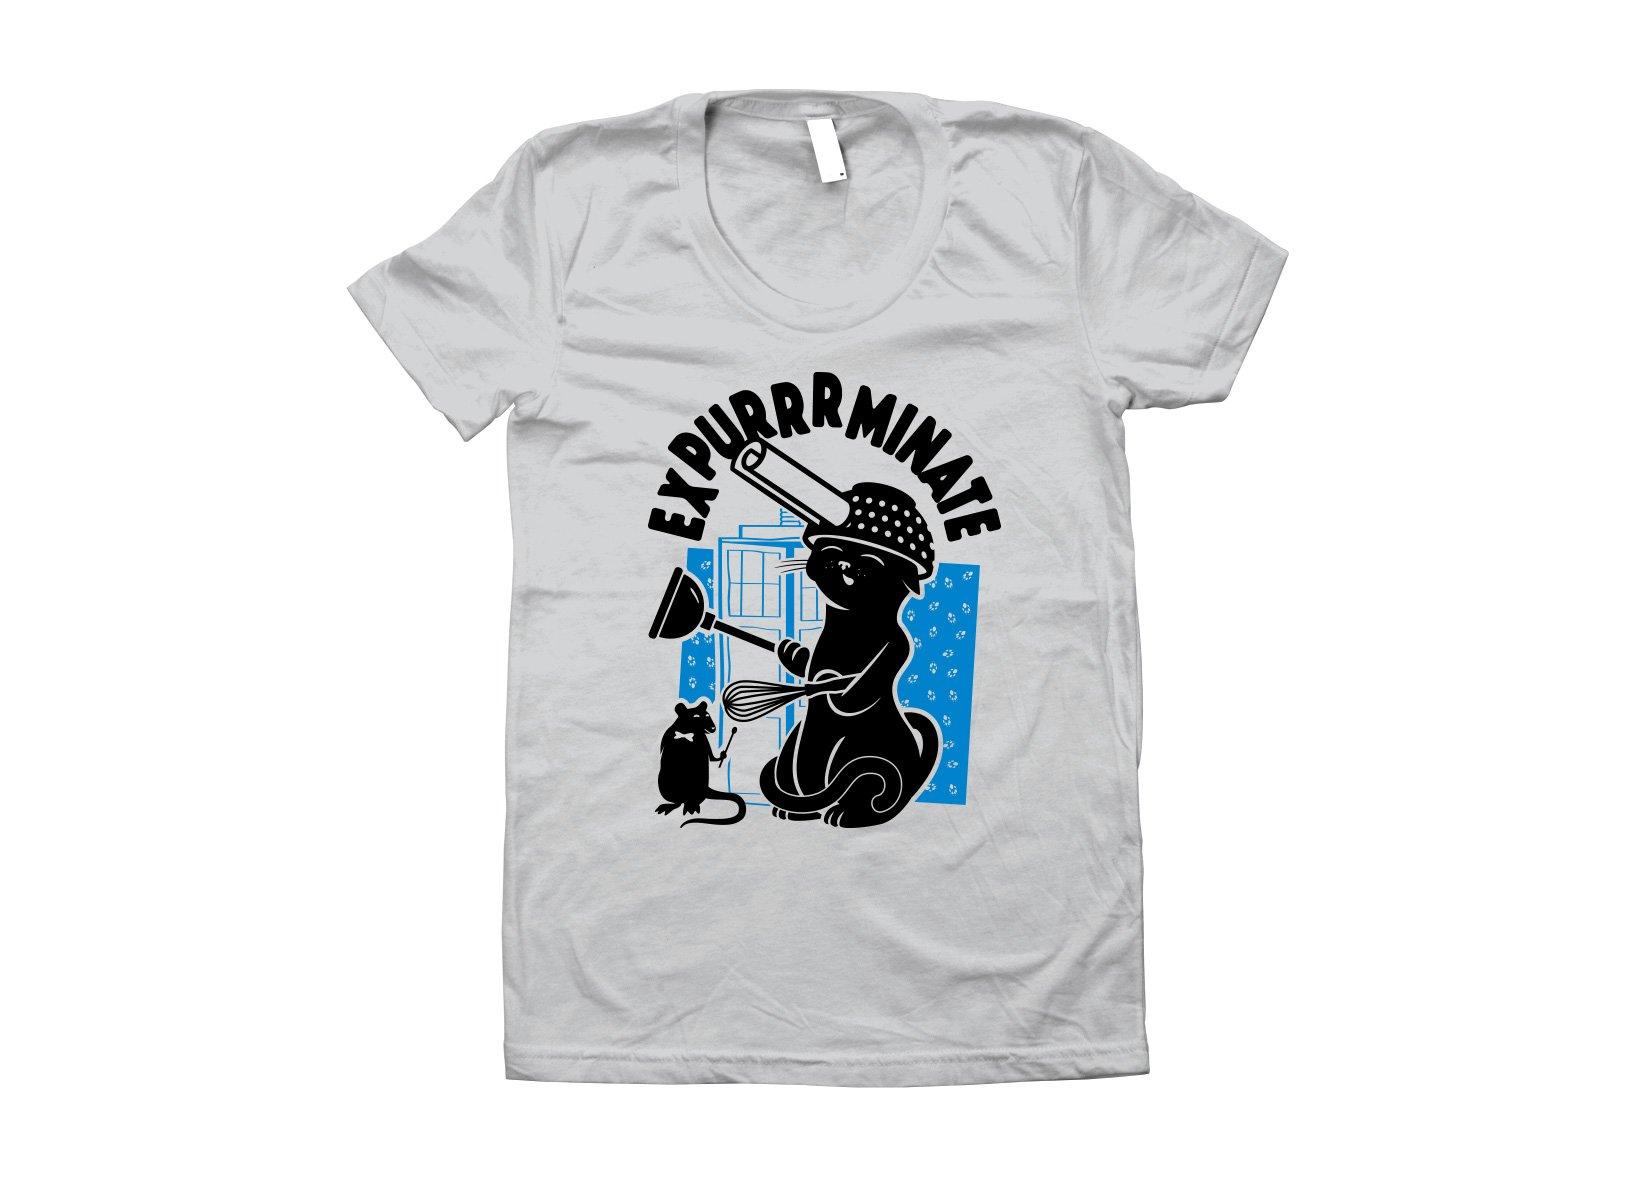 Expurrrminate on Juniors T-Shirt